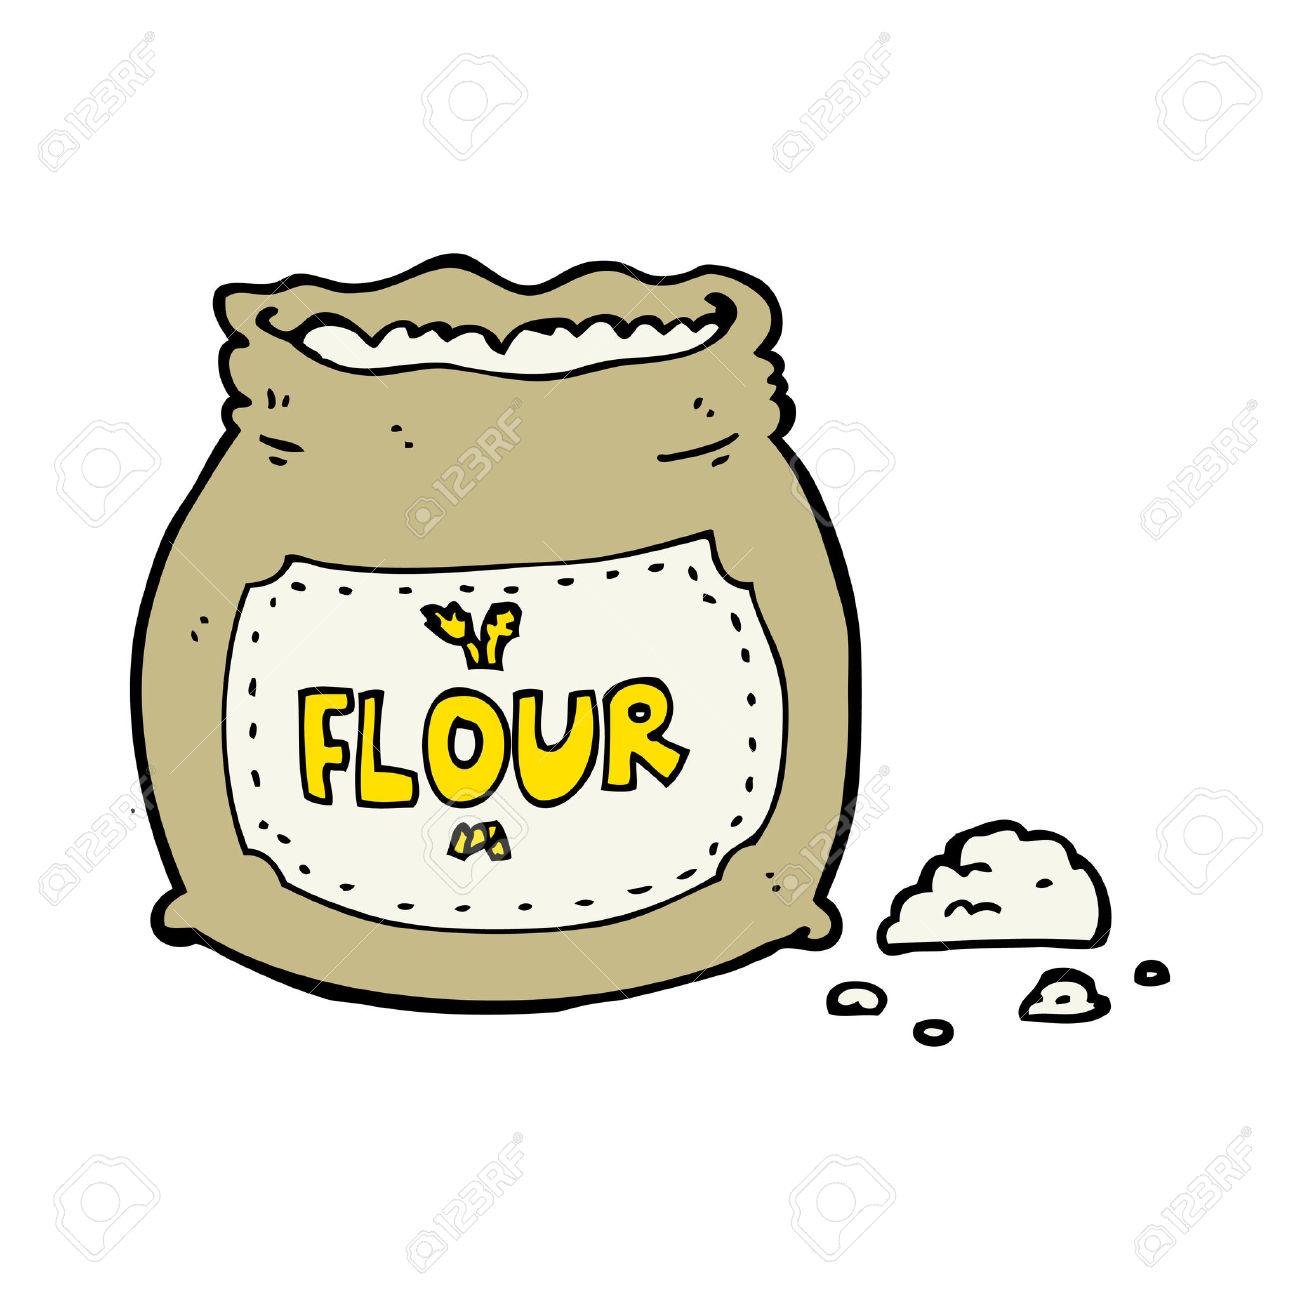 Flour Clip Art